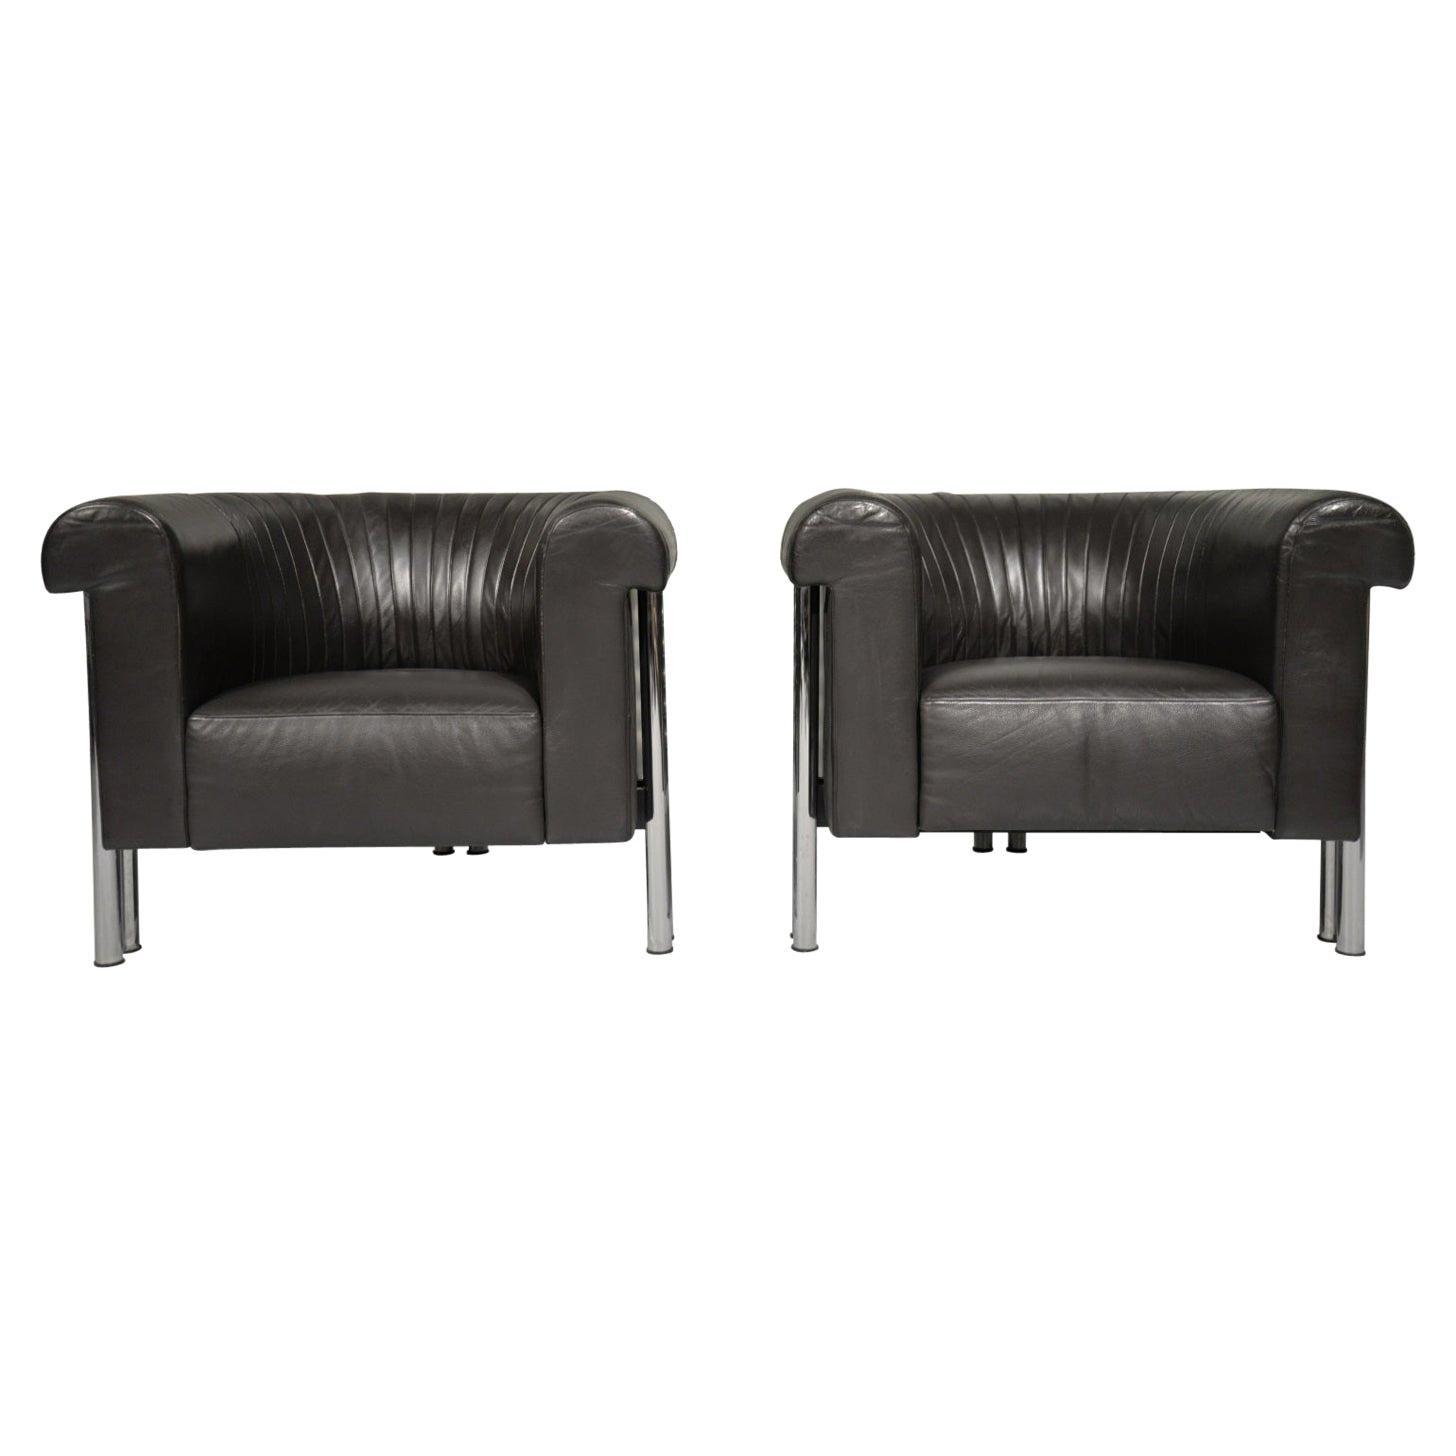 De Sede DS 700 Executive Lounge Armchairs, Switzerland, 1980s